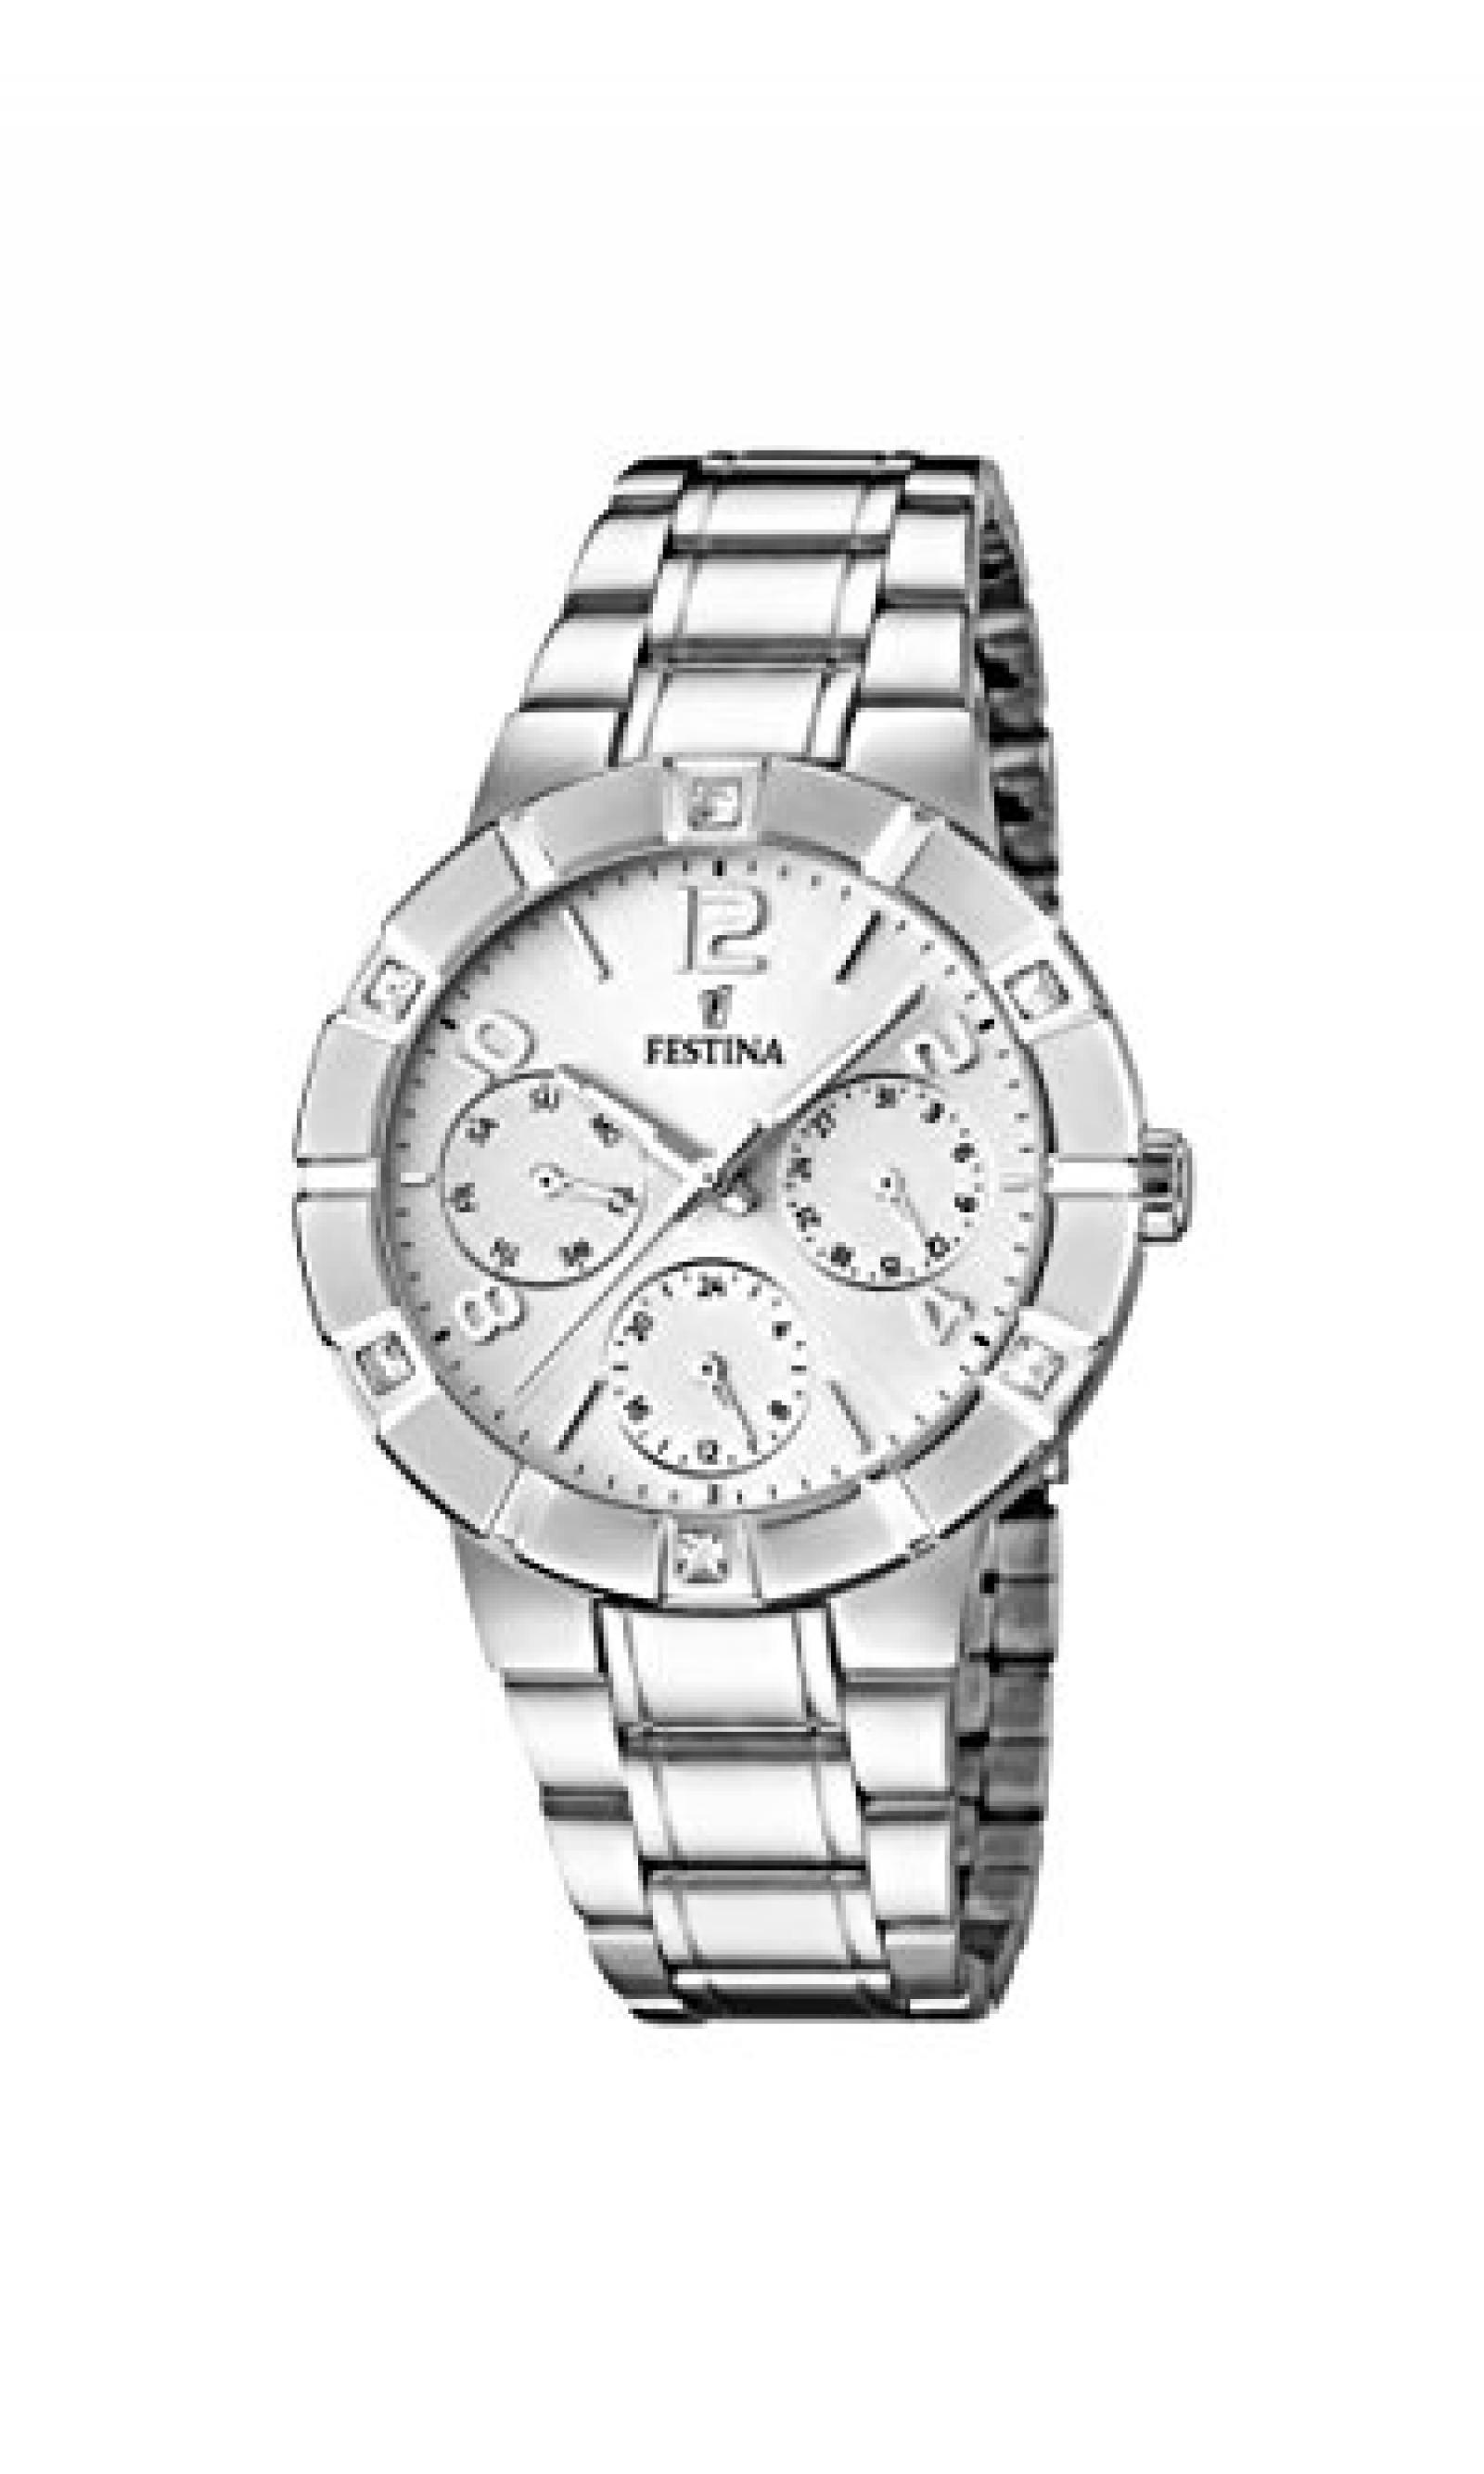 Festina Damen-Armbanduhr Analog Quarz Edelstahl F16706/1